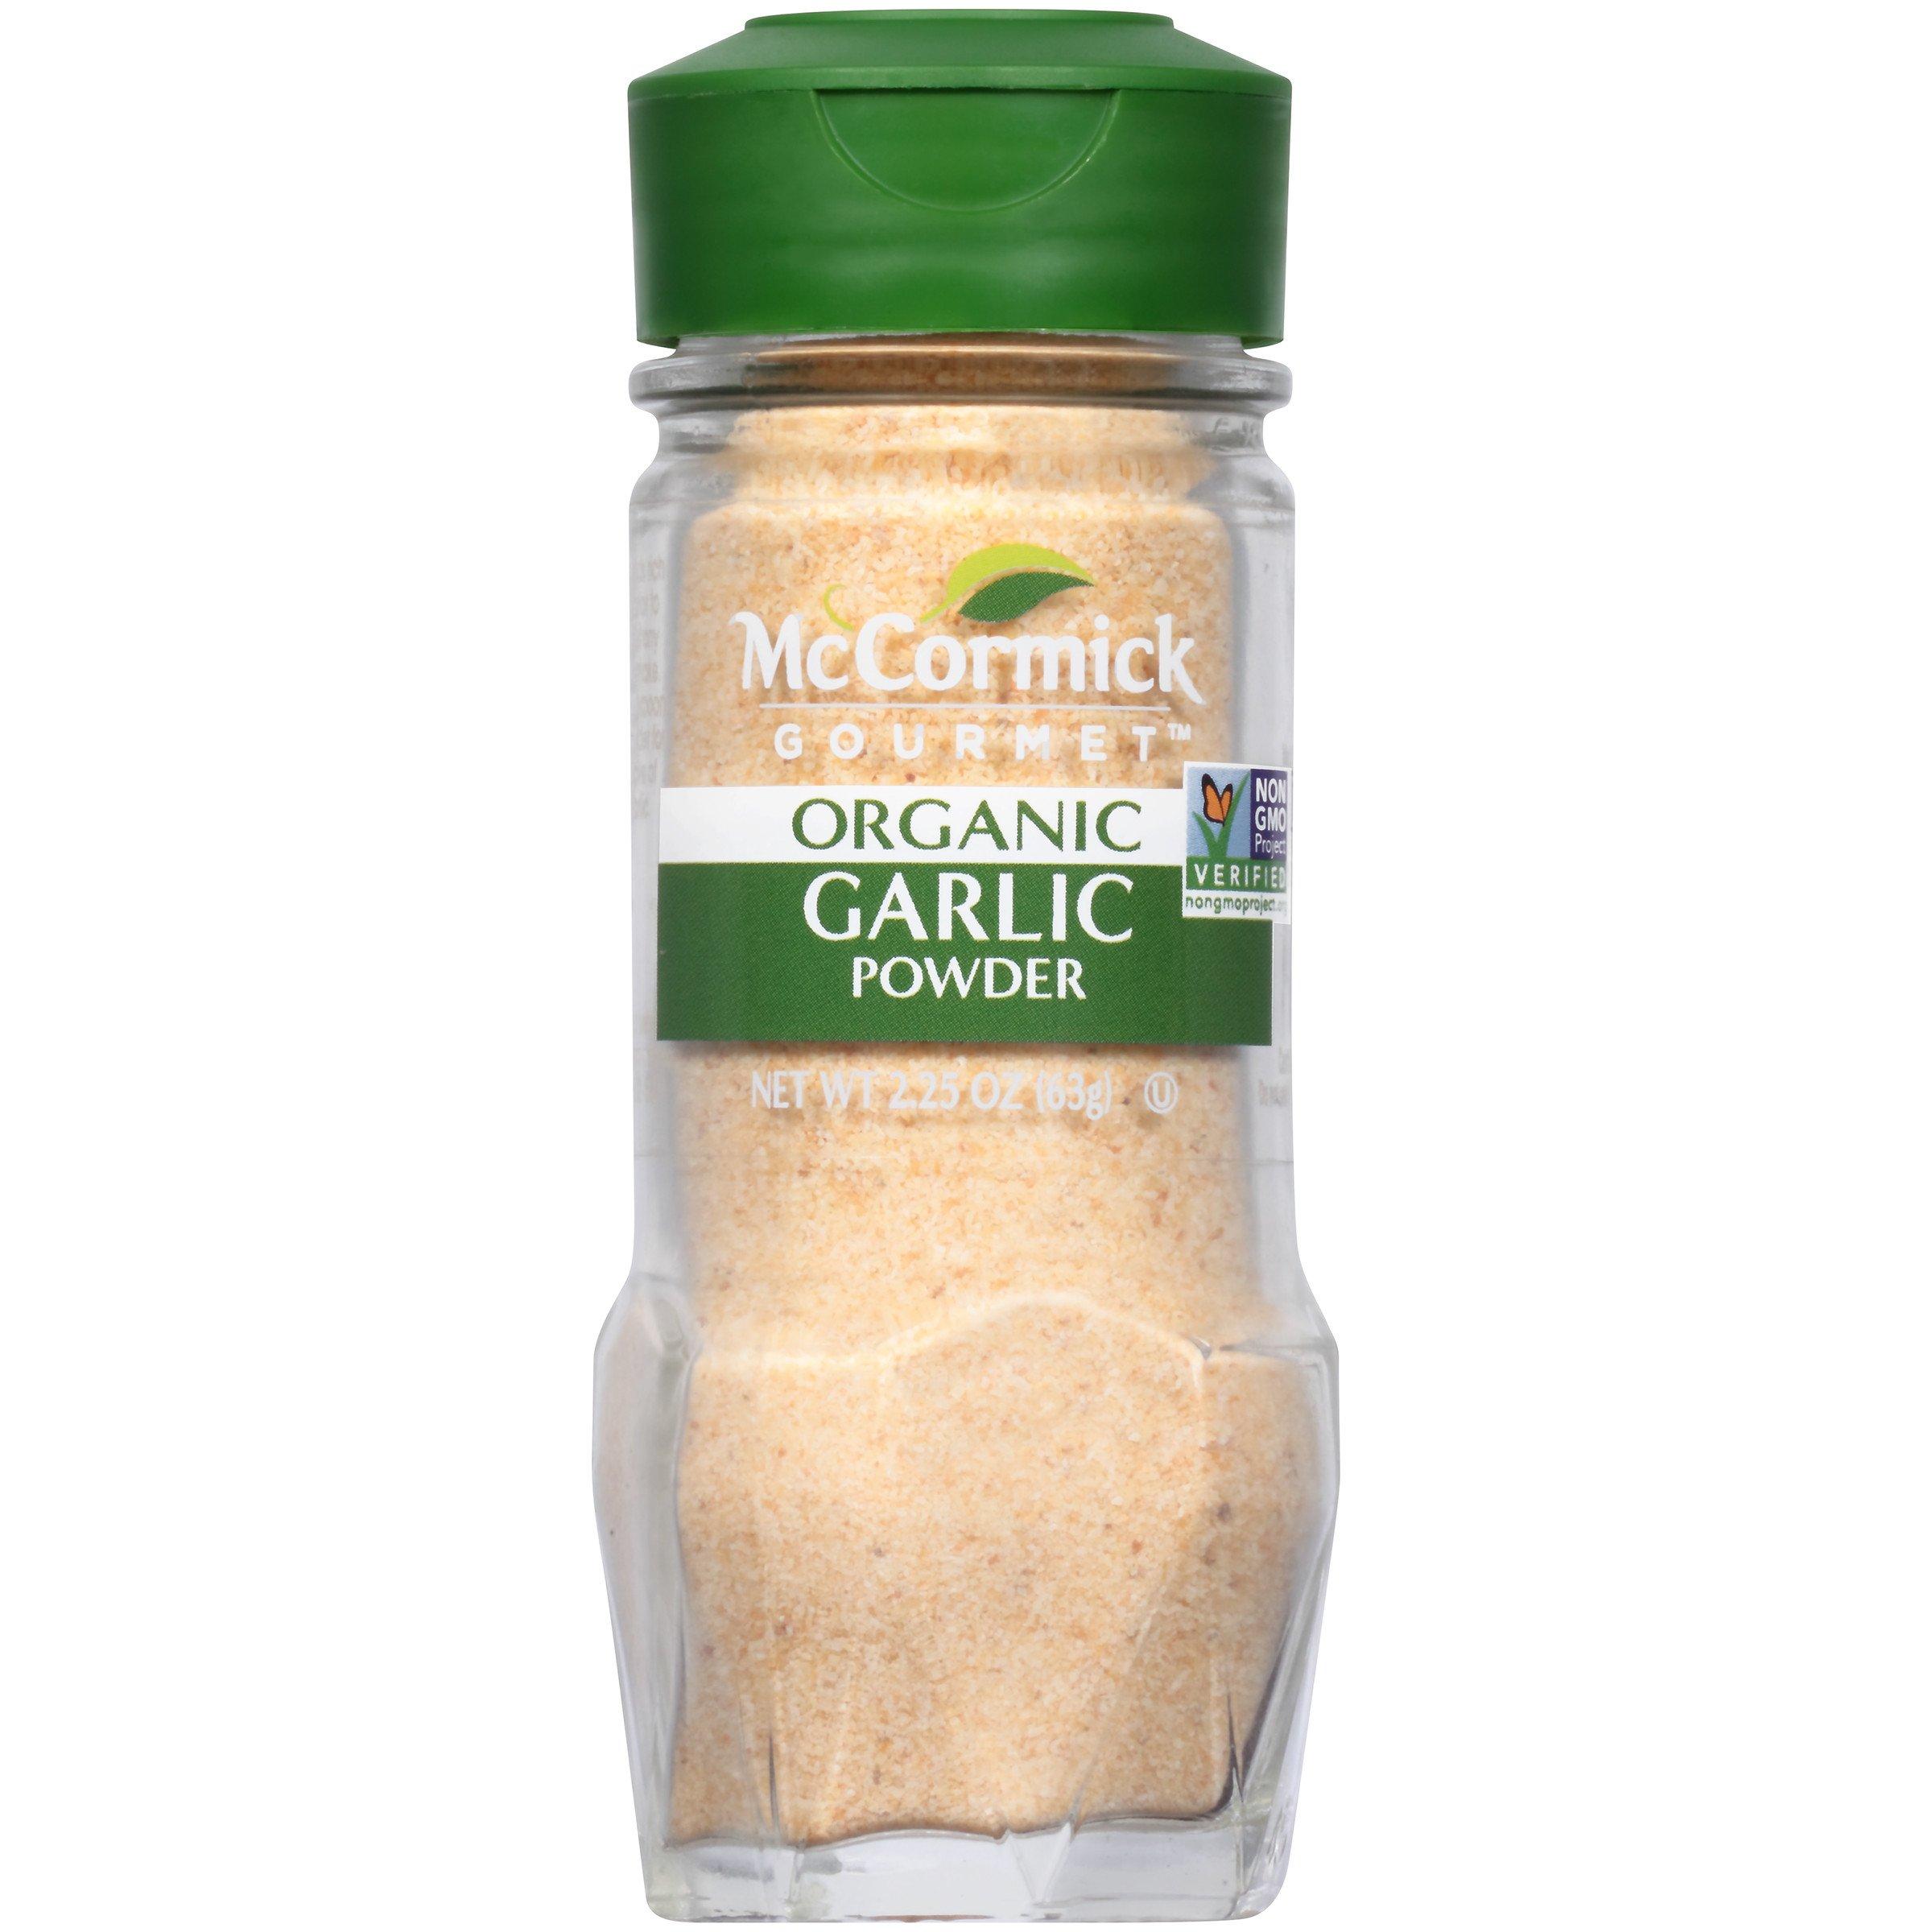 McCormick Gourmet Organic Garlic Powder, 2.25 oz